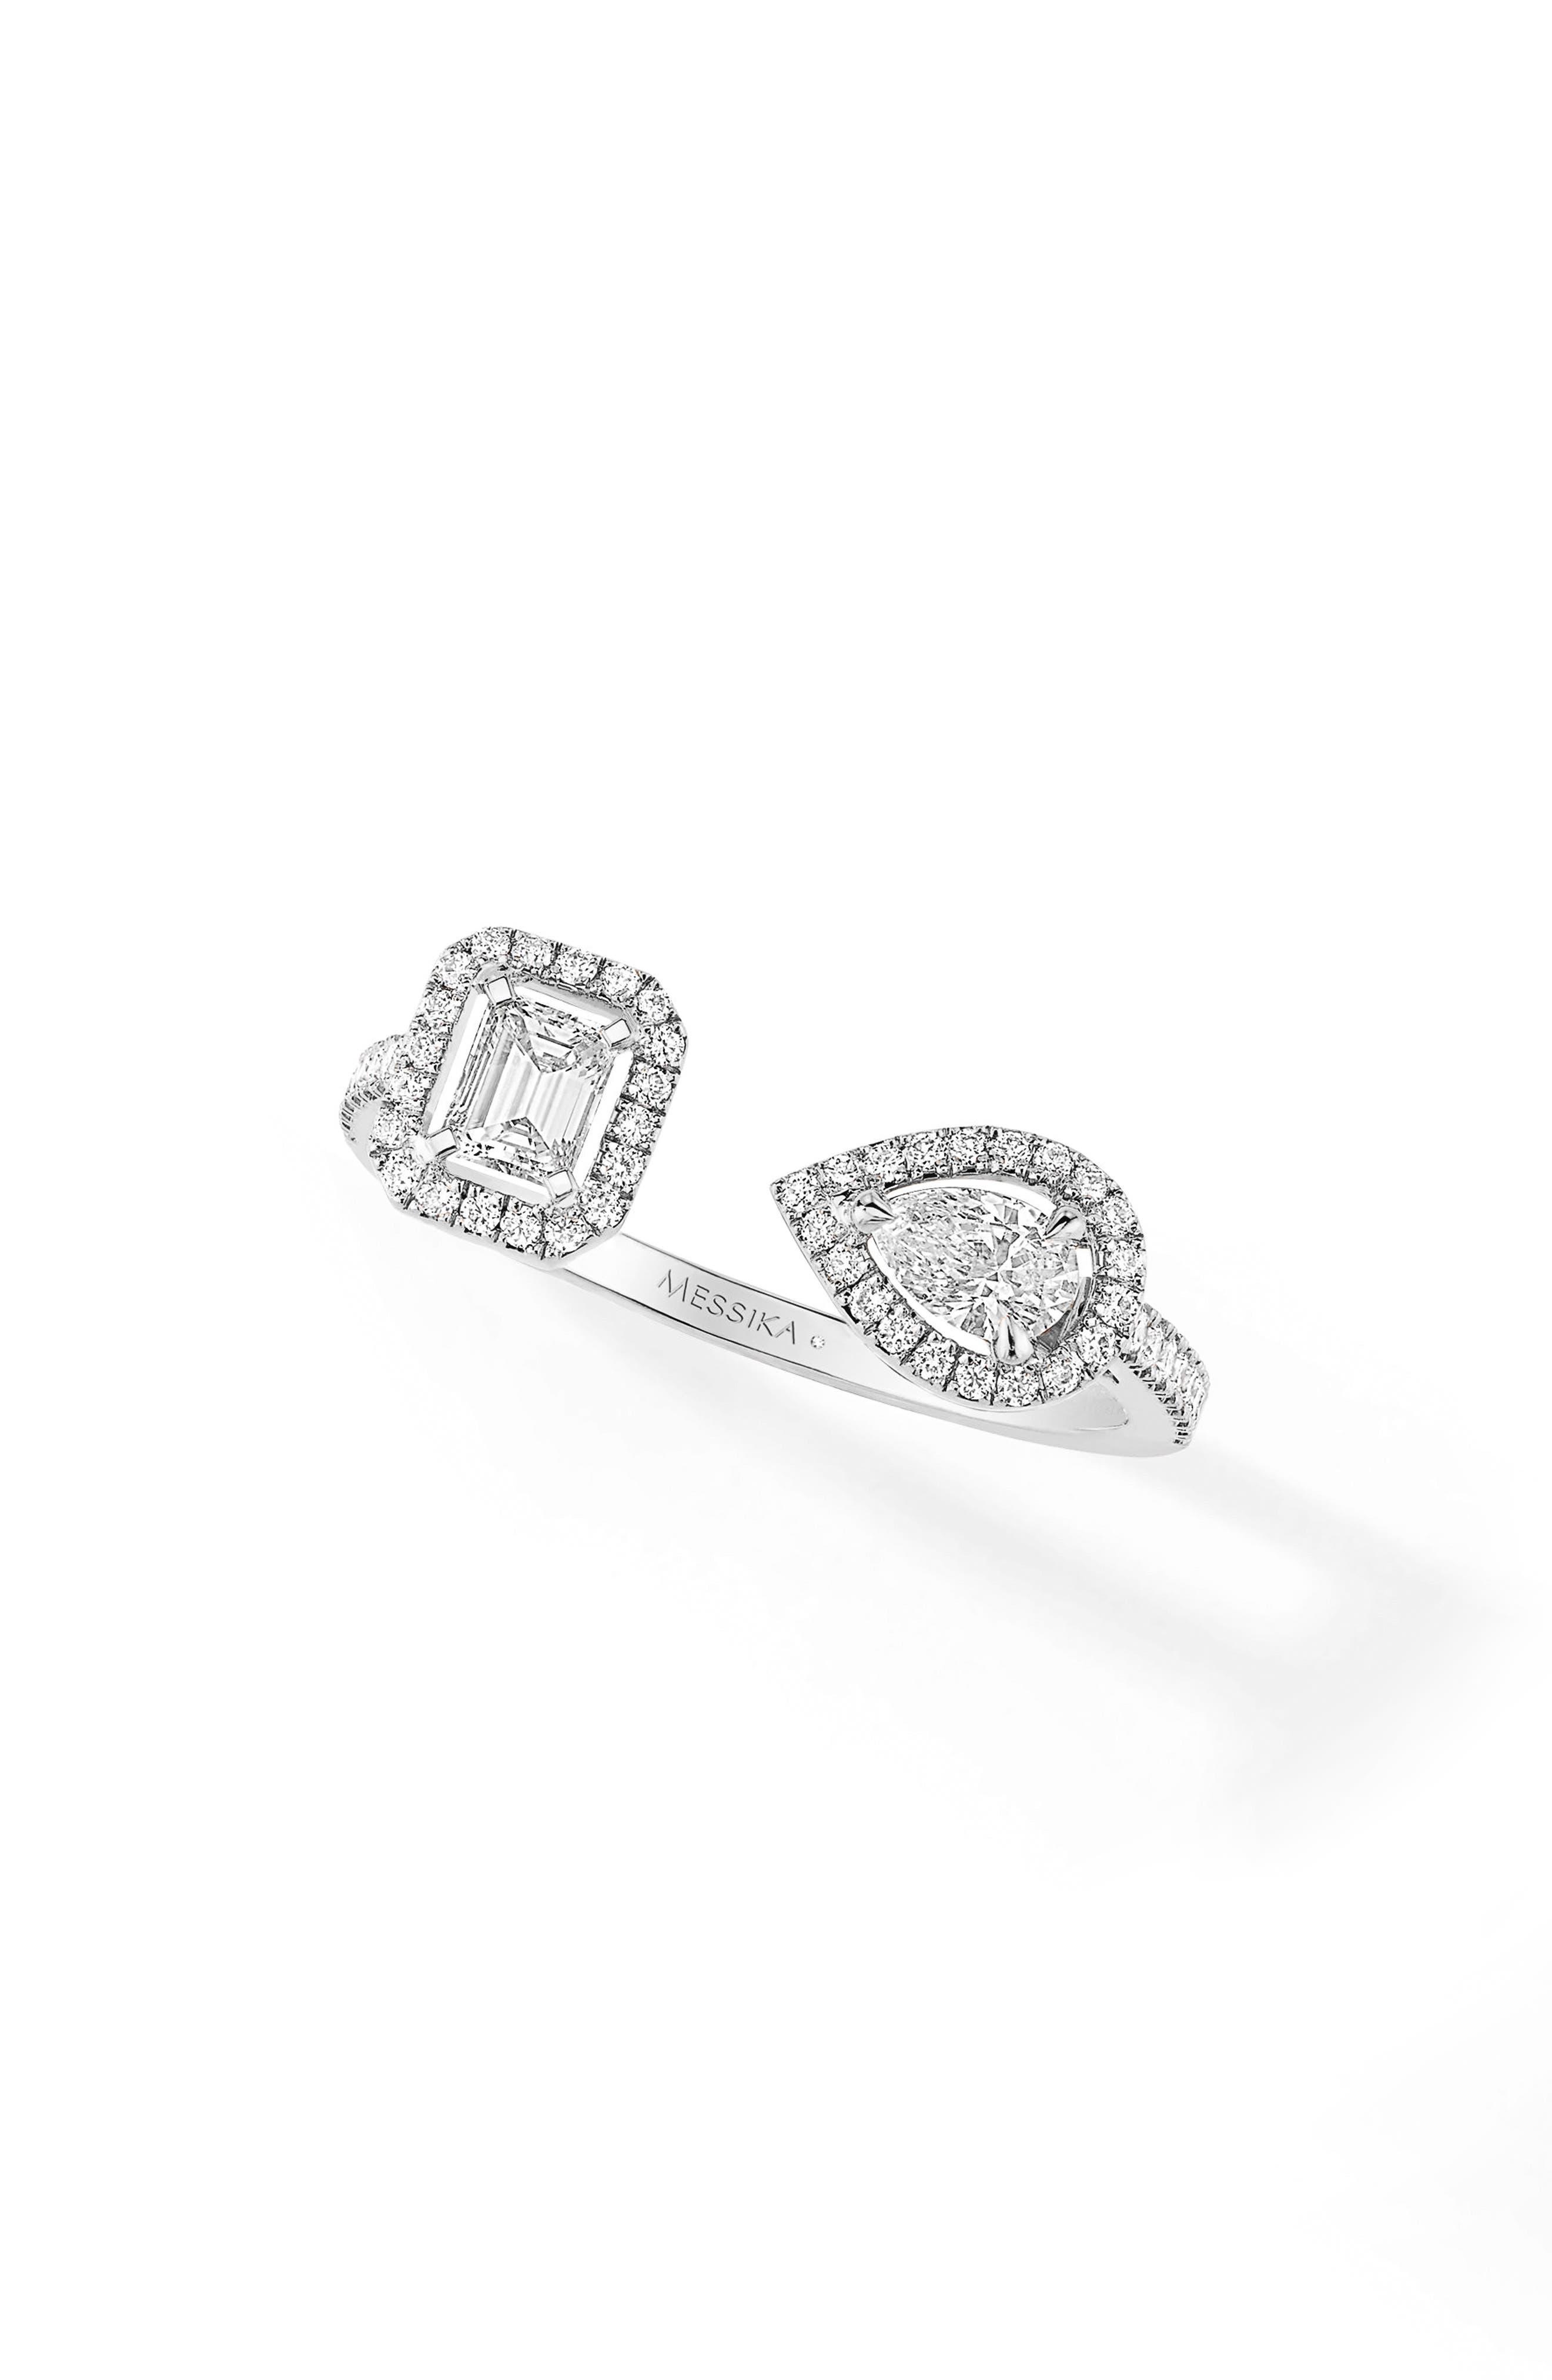 Messika My Twin Diamond Ring